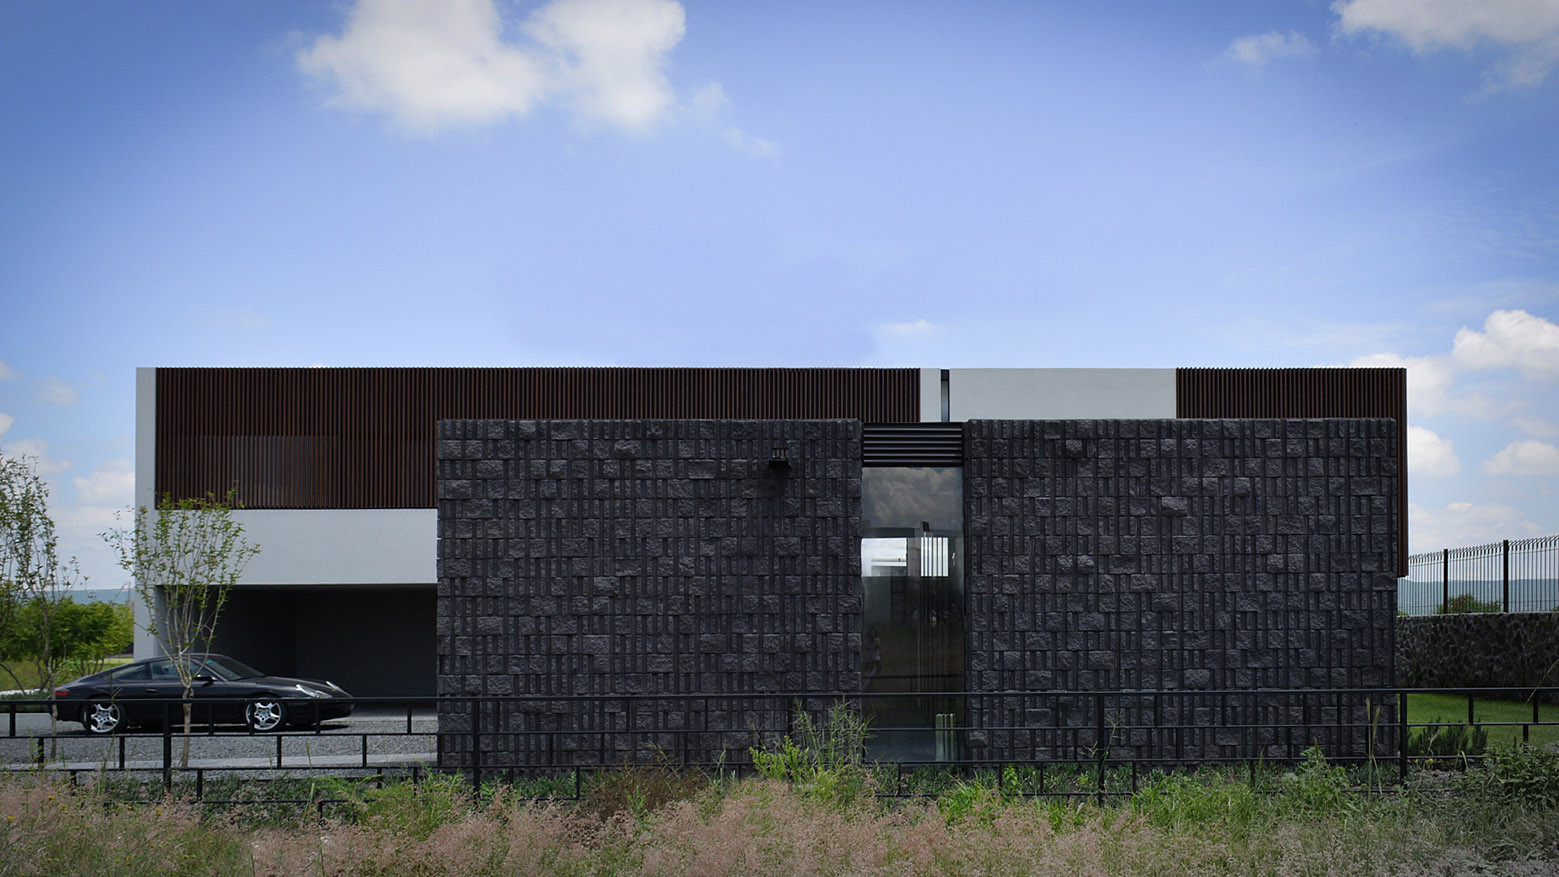 Congregación 341 / Laboratorio de Arquitectura [mk]